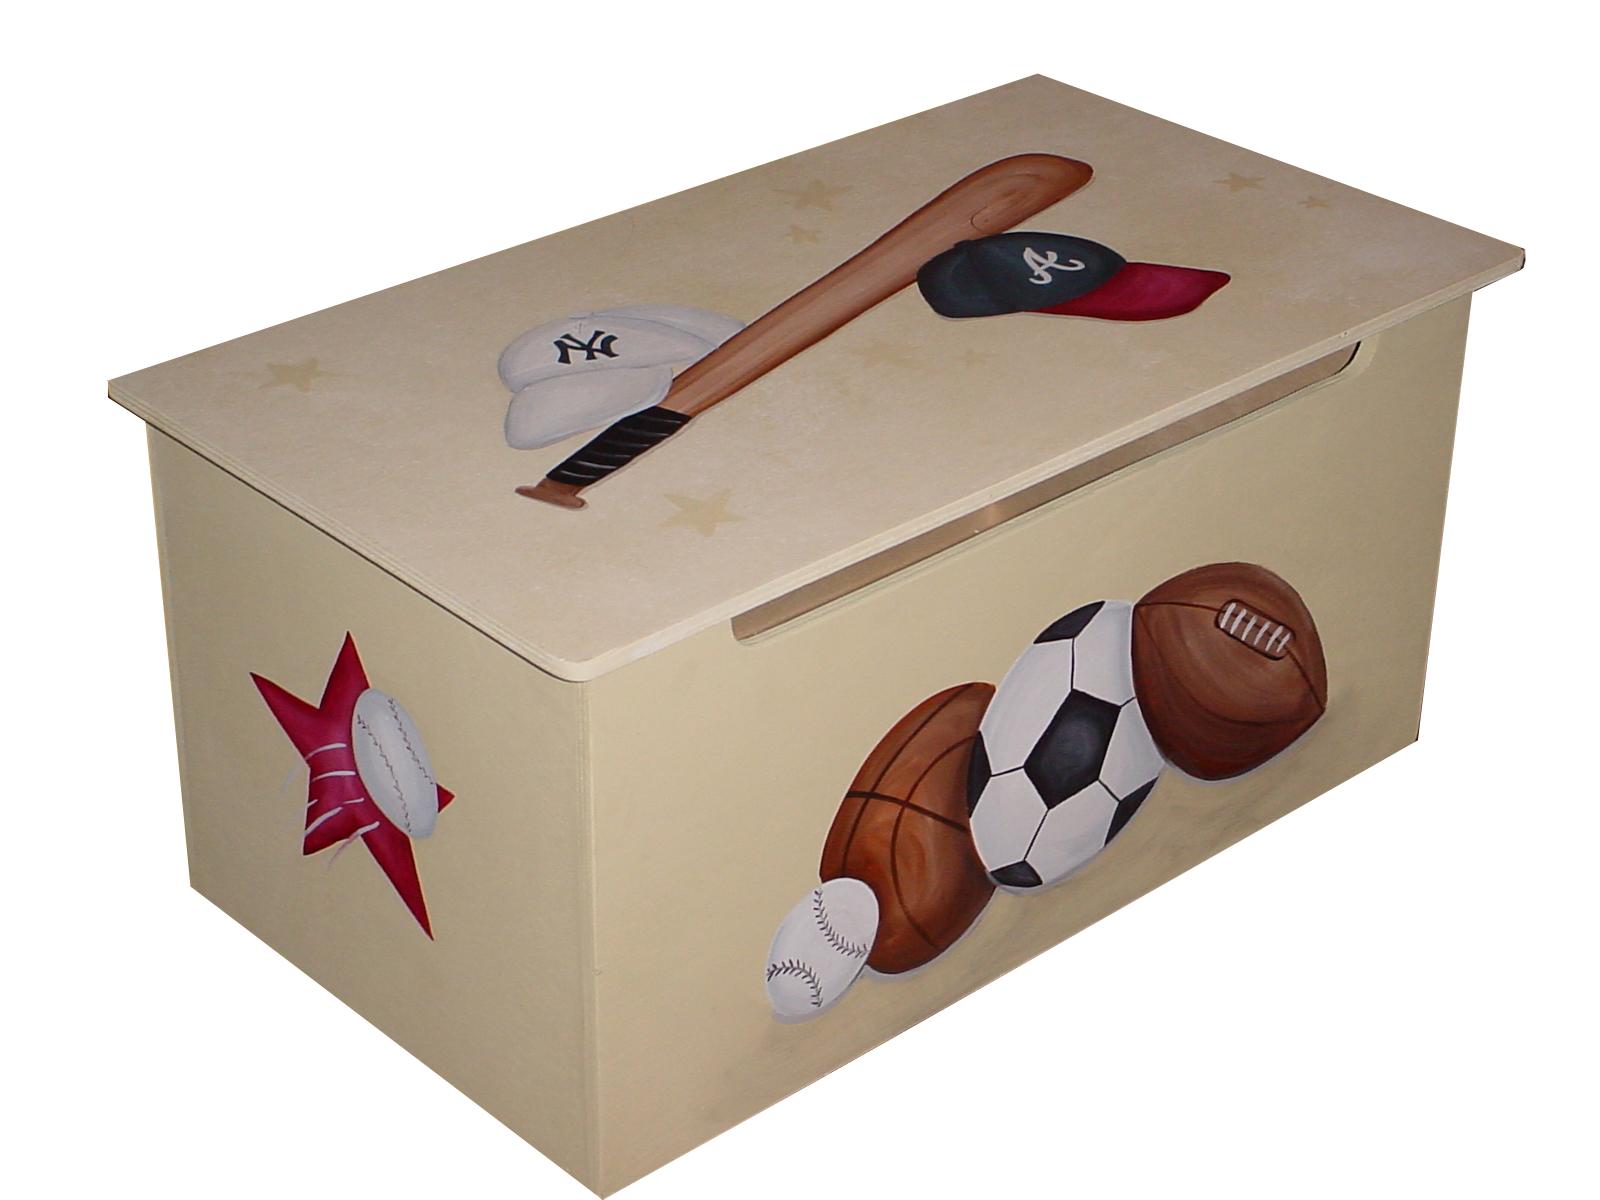 Toys Boxs 83